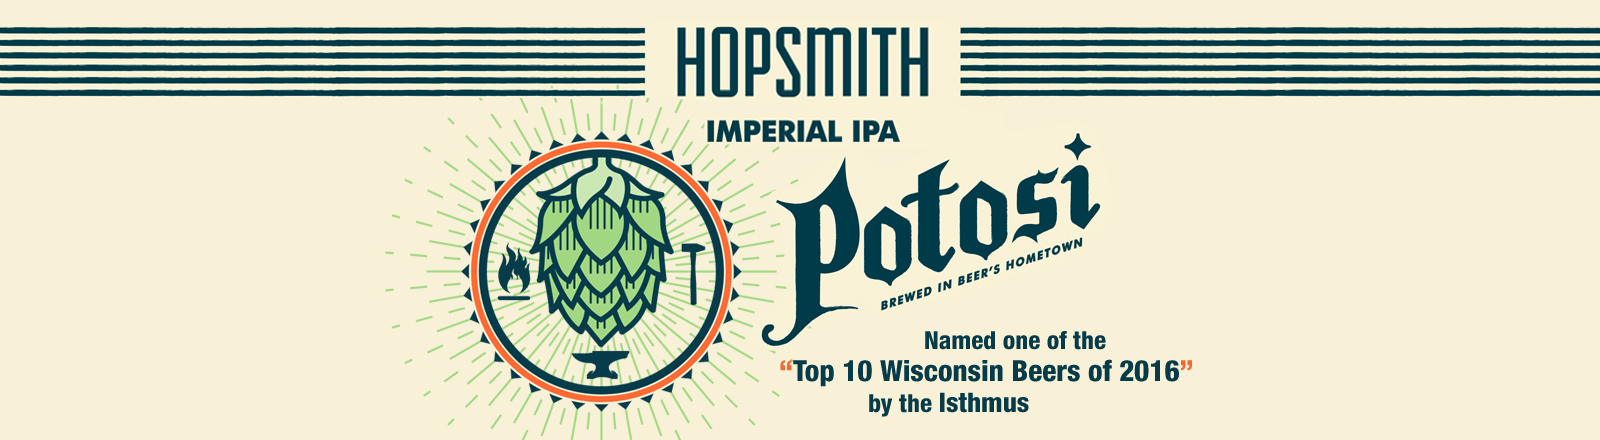 hopsmith-homepage